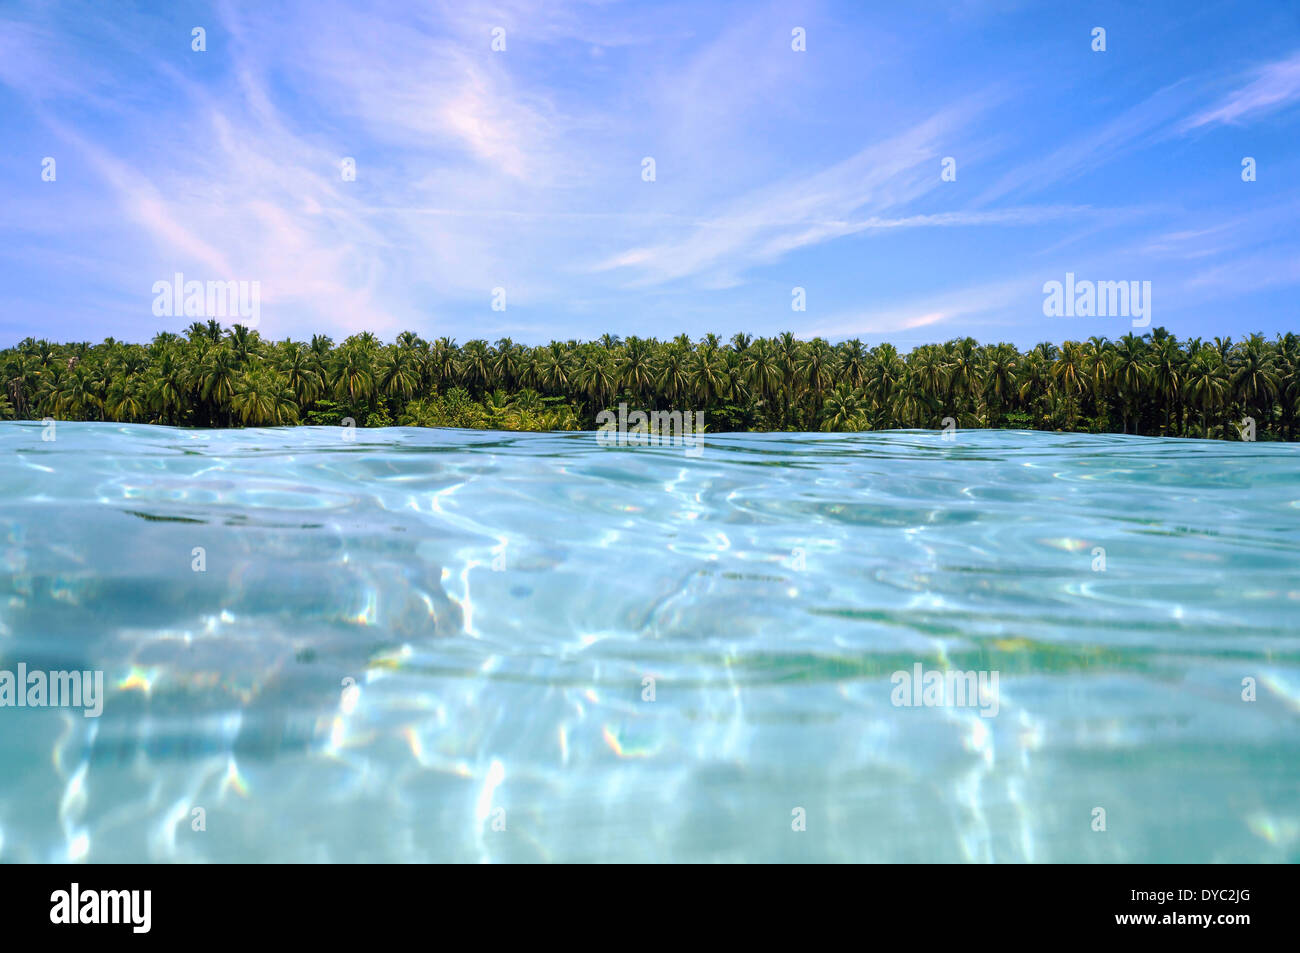 Kokosnuss-Bäume-Horizont von der Wasseroberfläche Stockbild